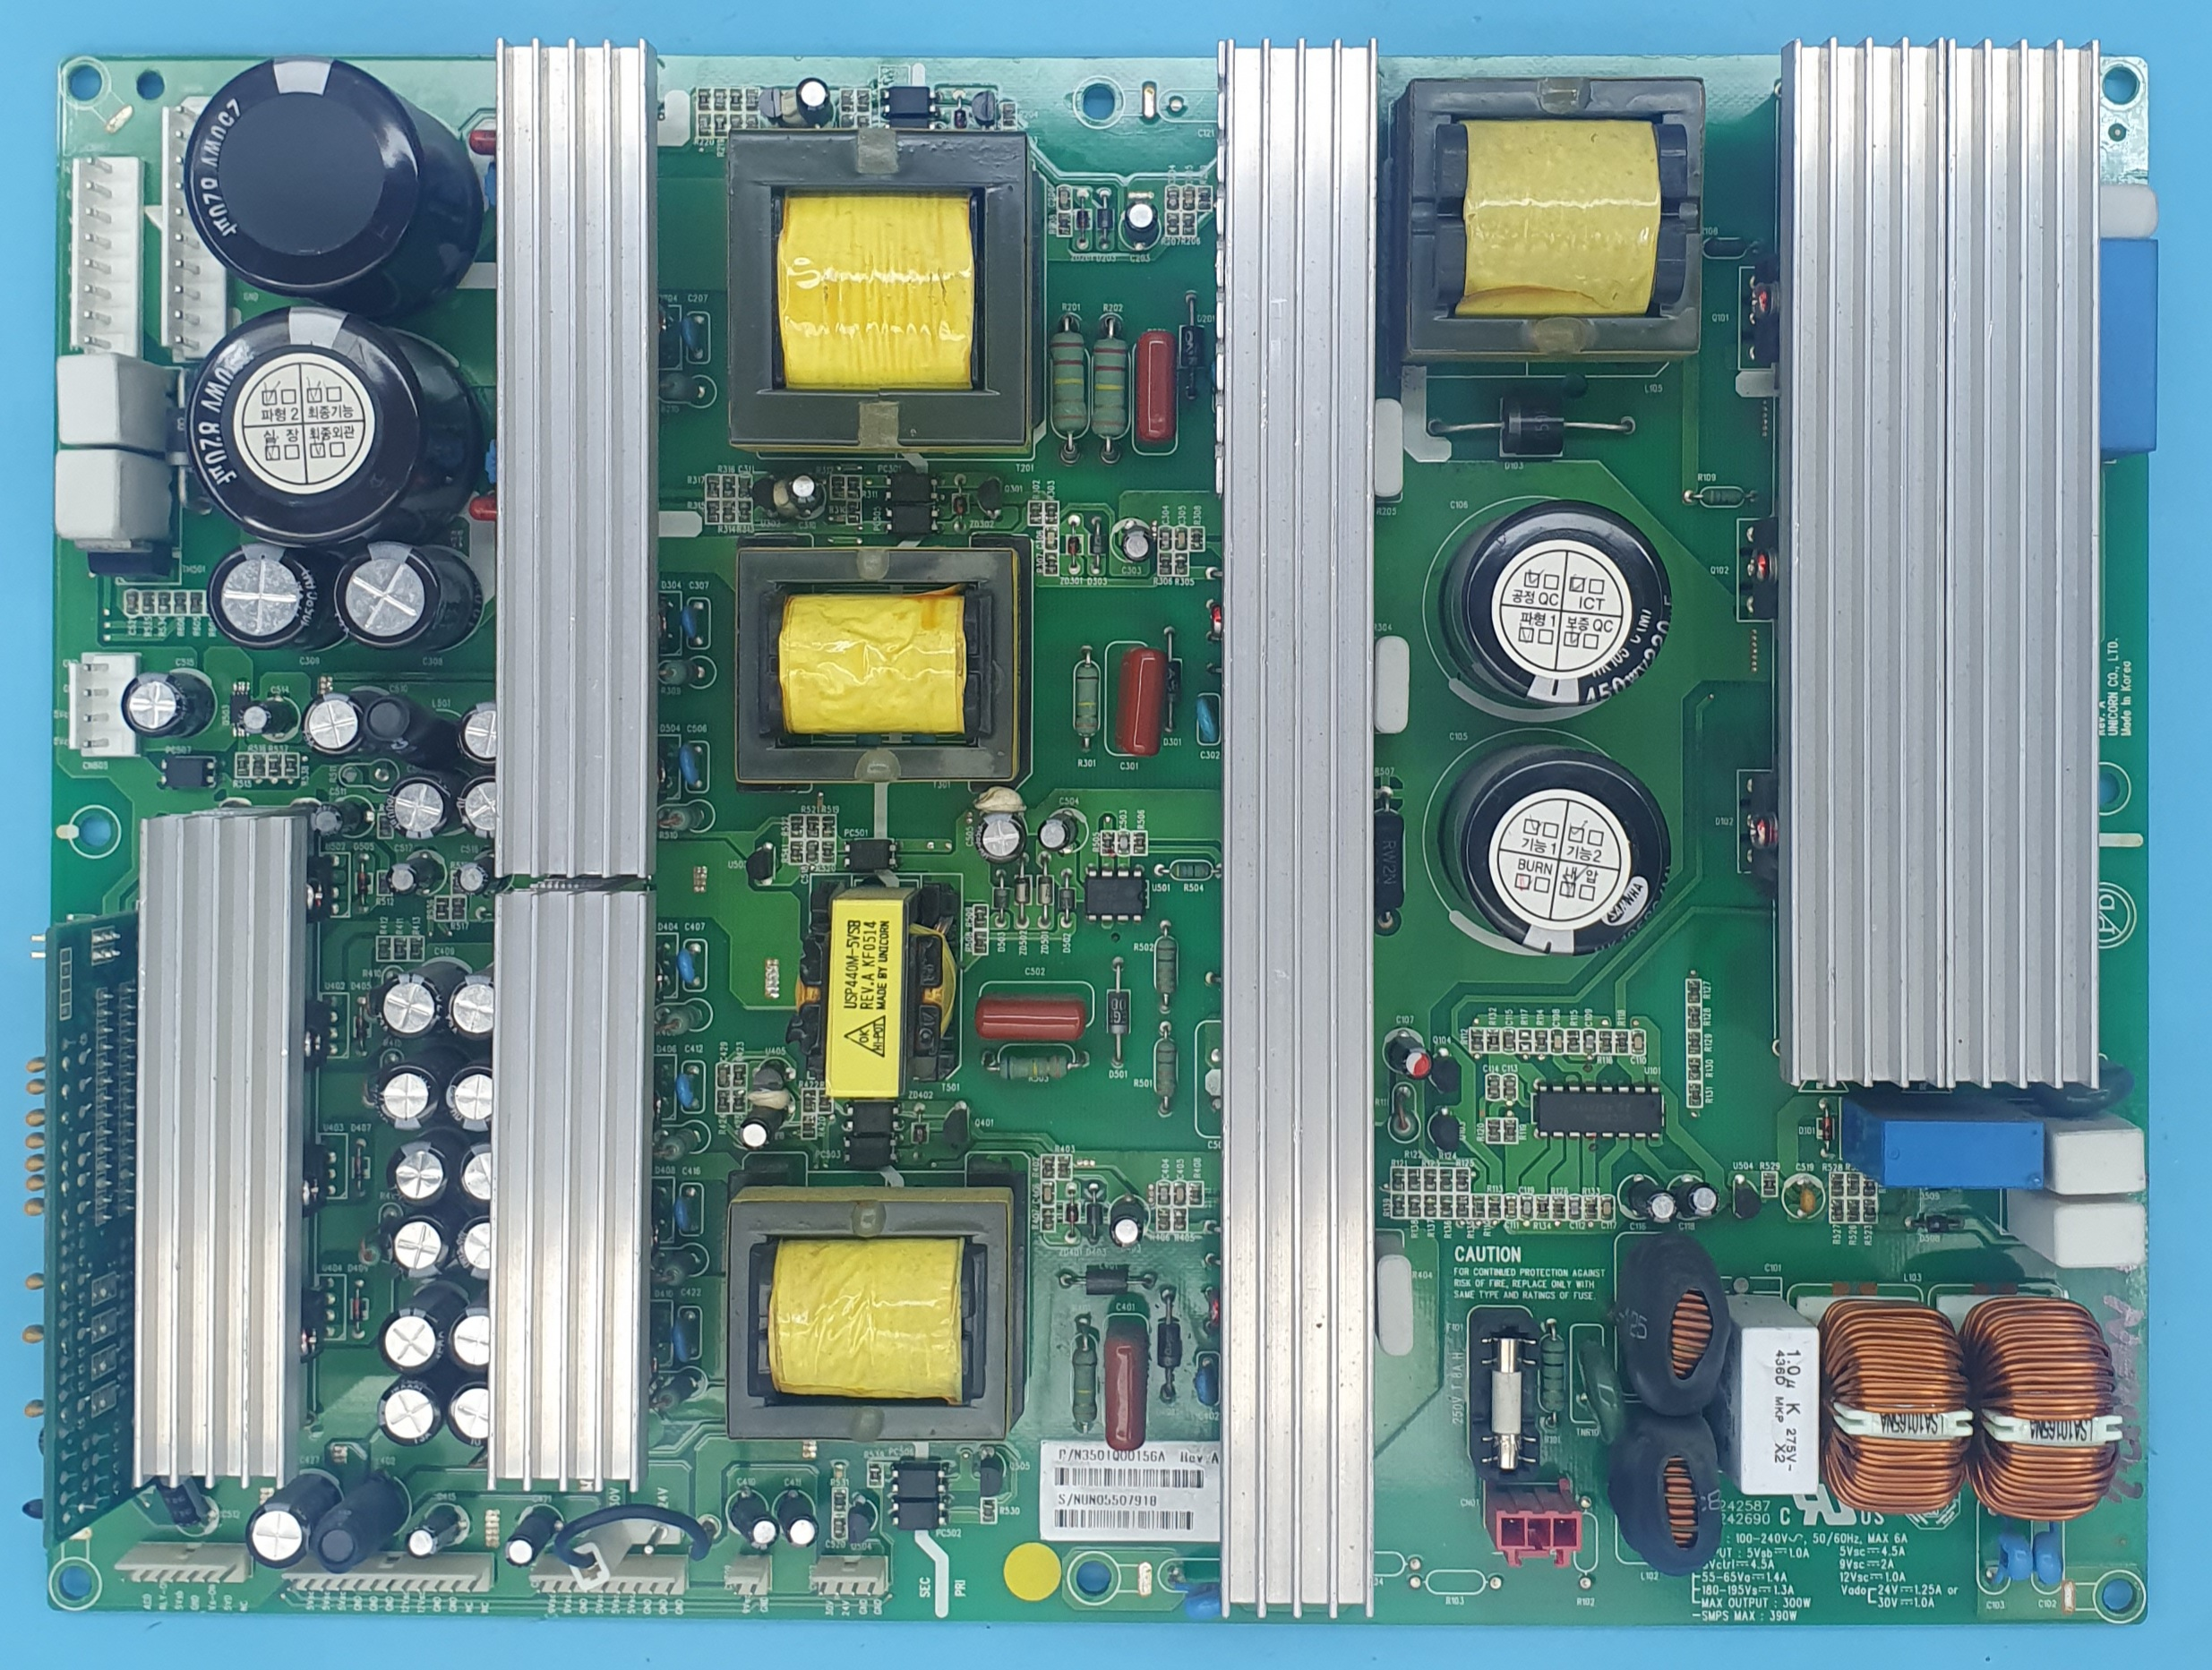 USP440M-42LP LG Power (KDV DAHİL = 100 TL)